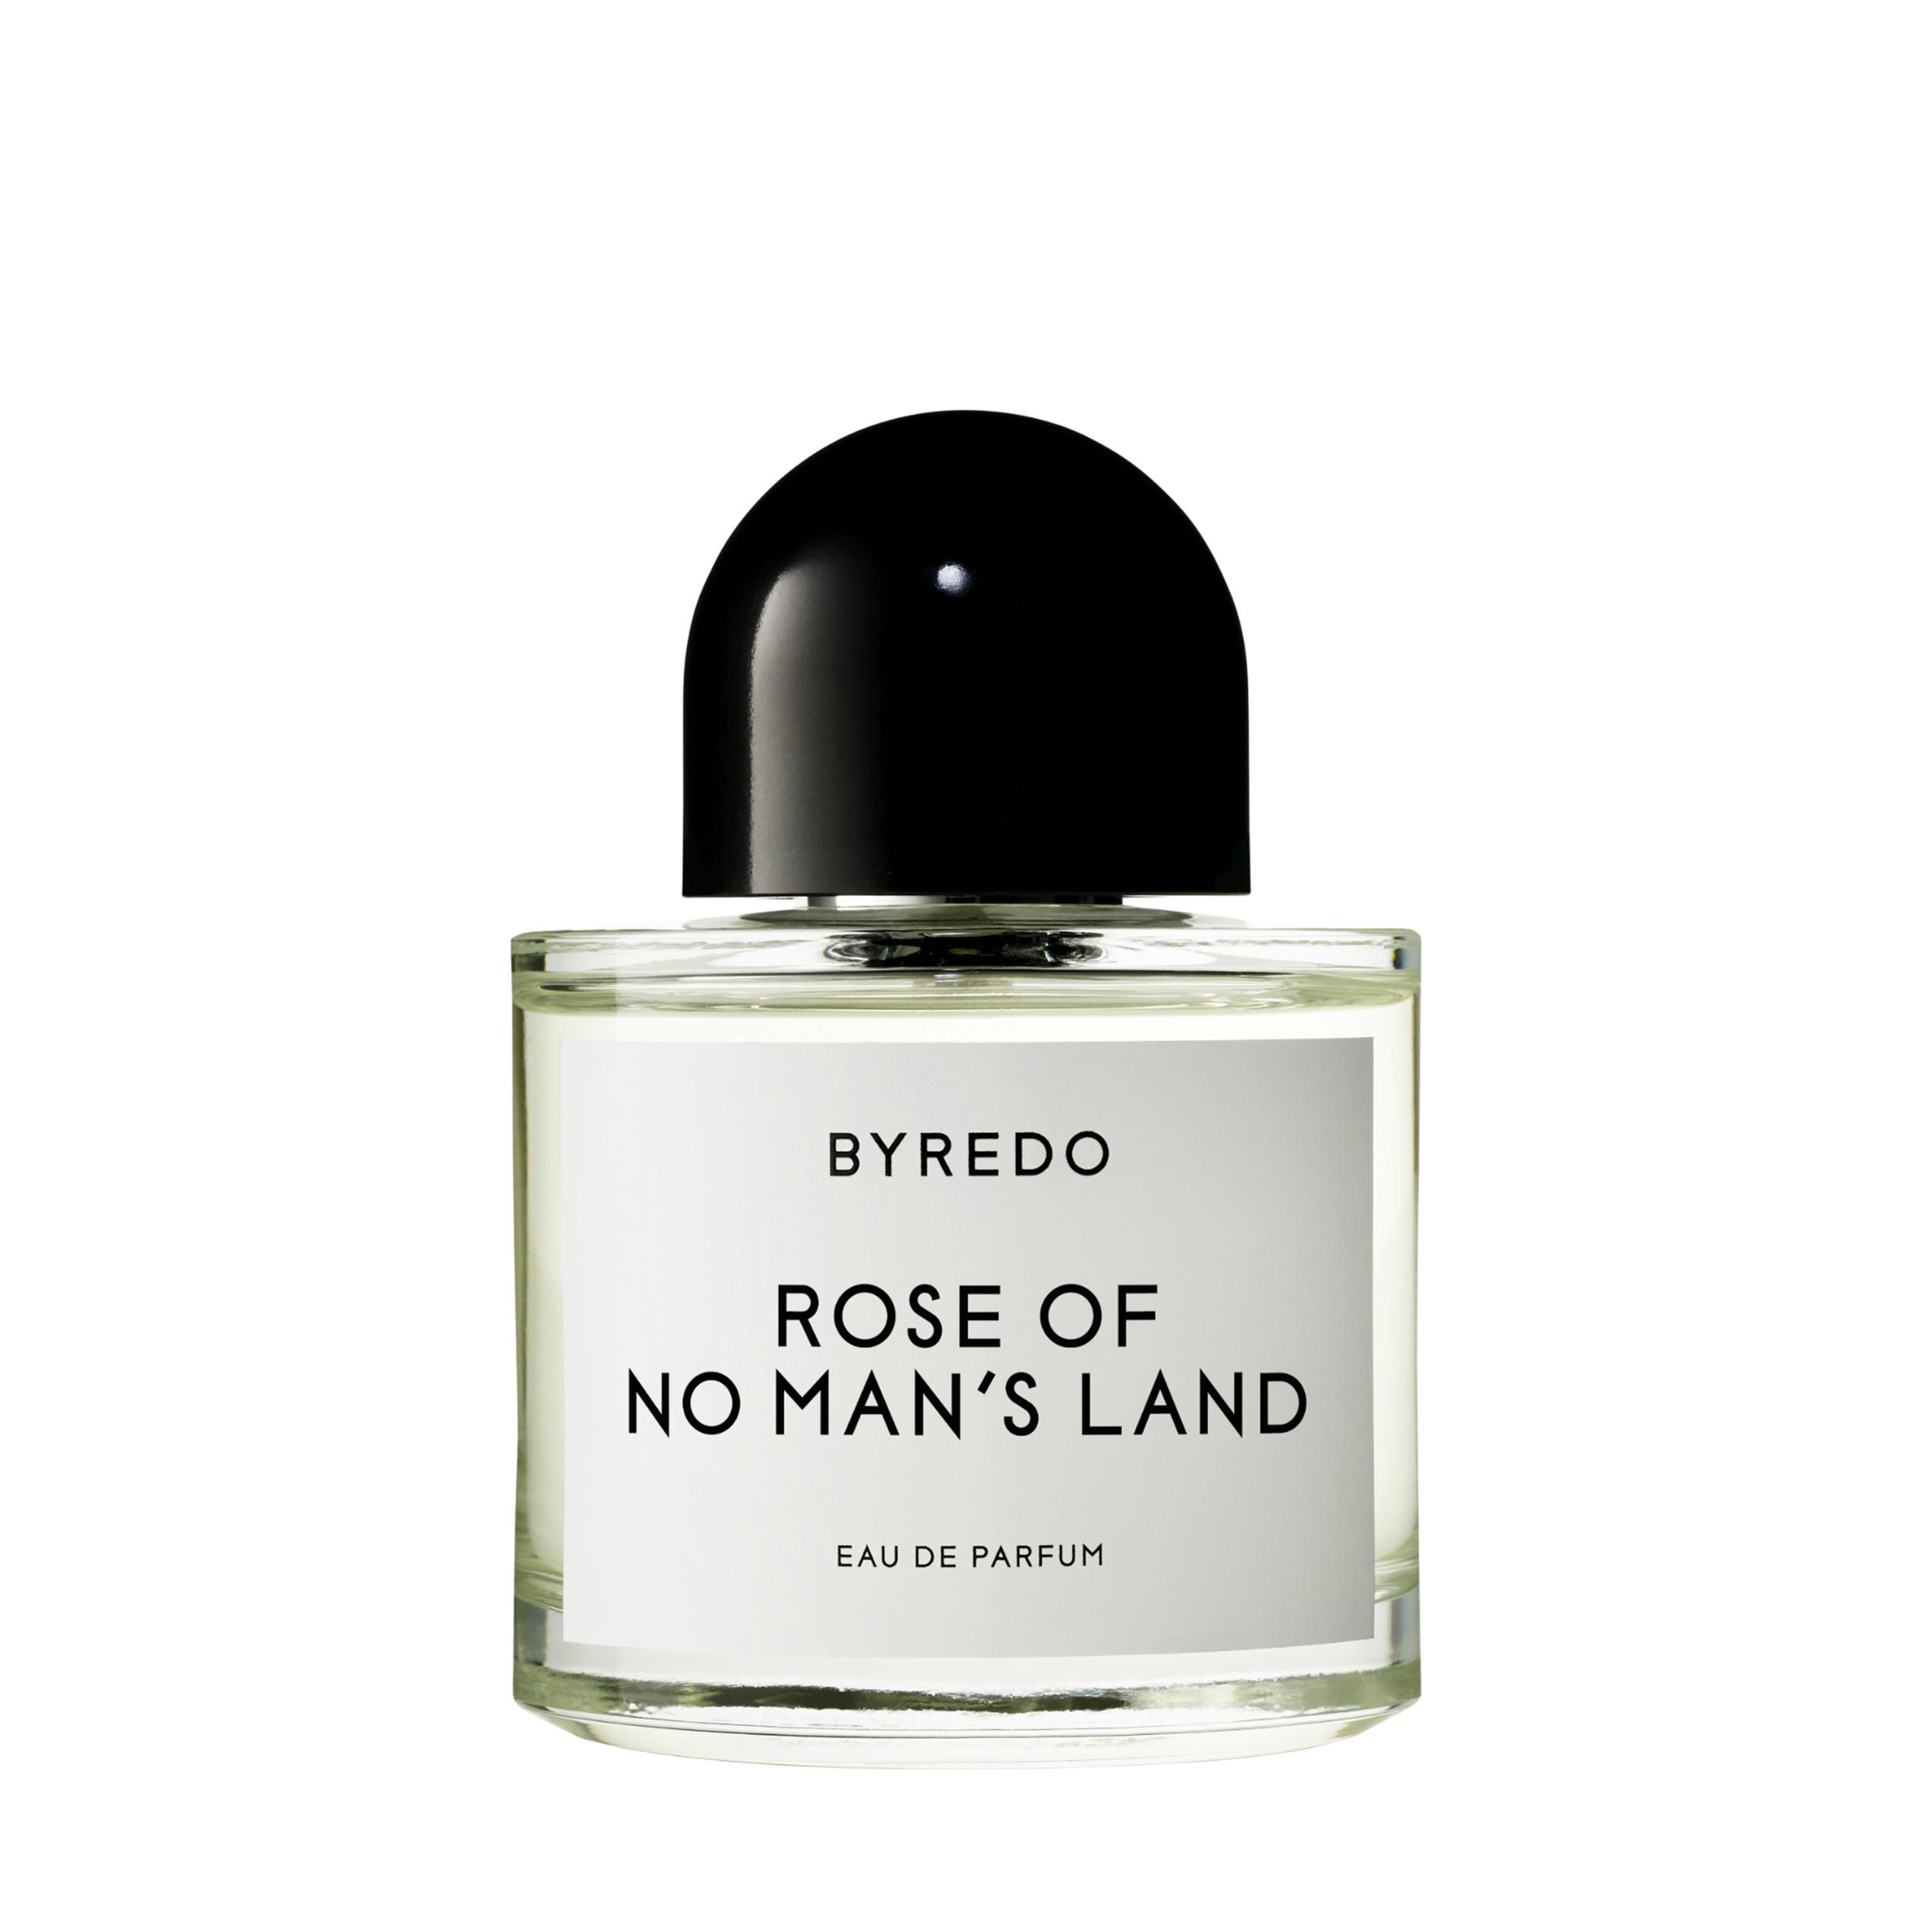 BYREDO Парфюмерная вода «ROSE OF NO MAN'S LAND» 100 мл  - Купить